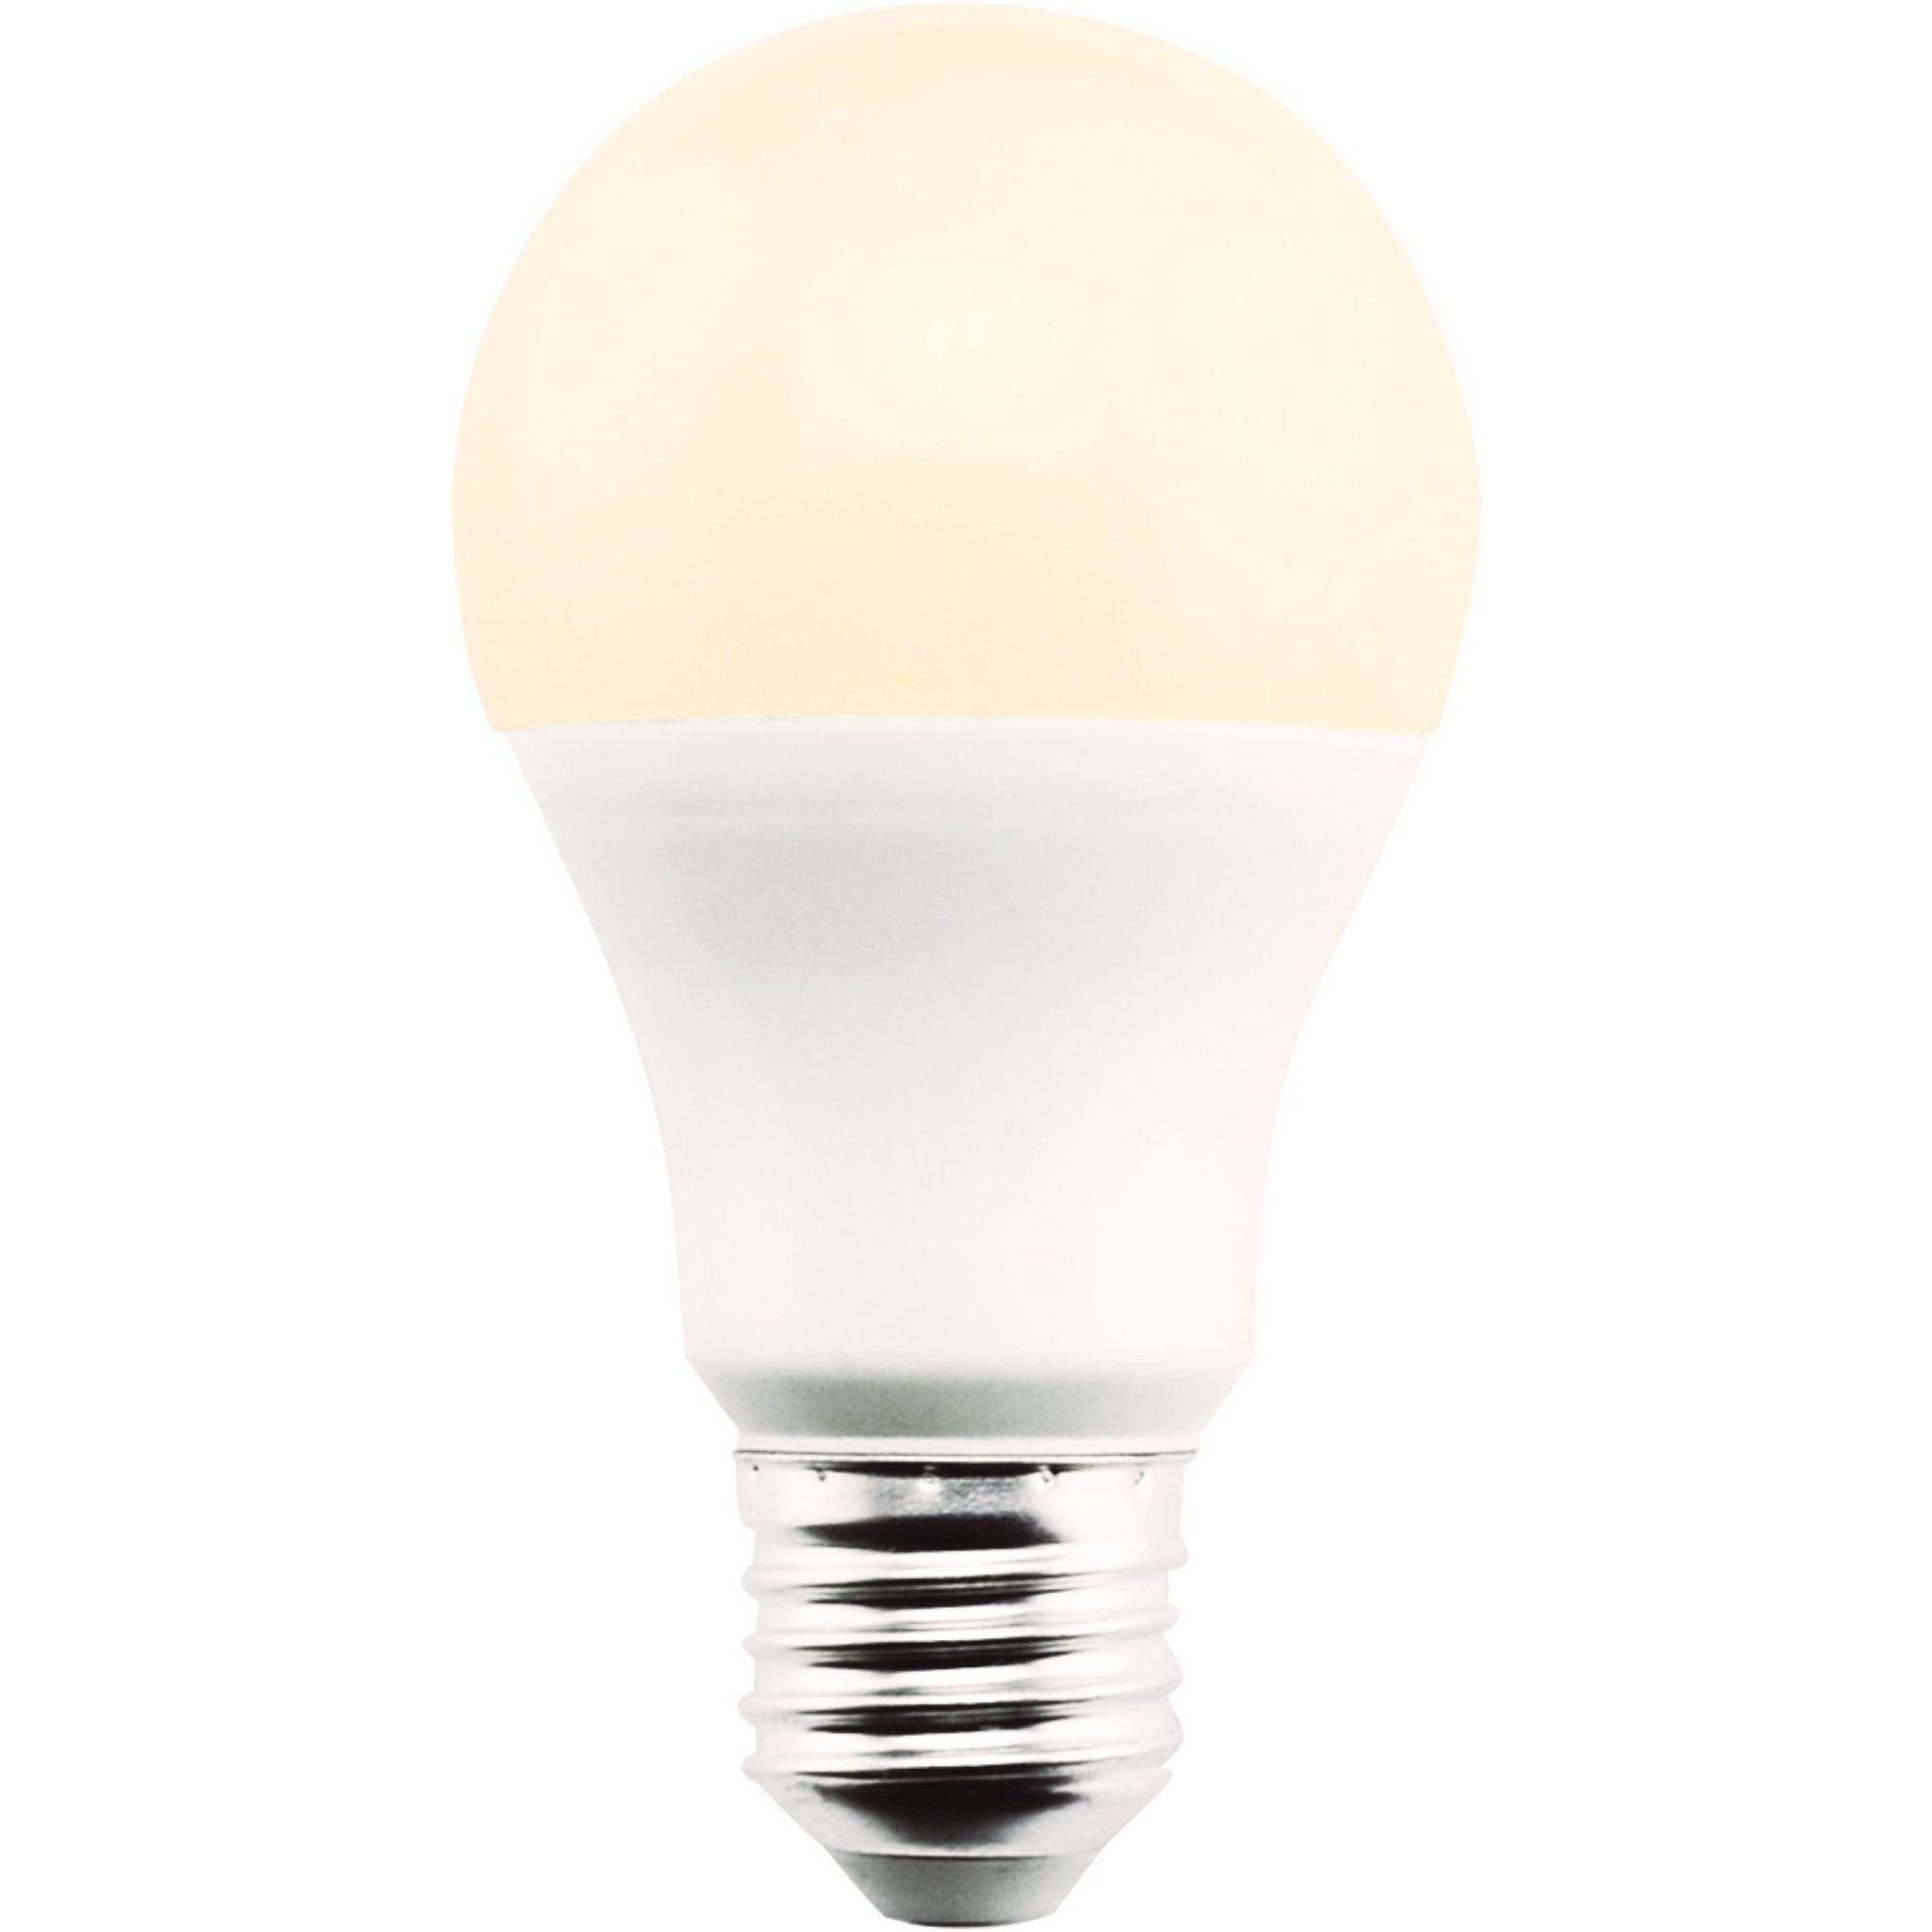 Лампа Ecola Premium светодионая E27 12 Вт груша Лм теплый свет